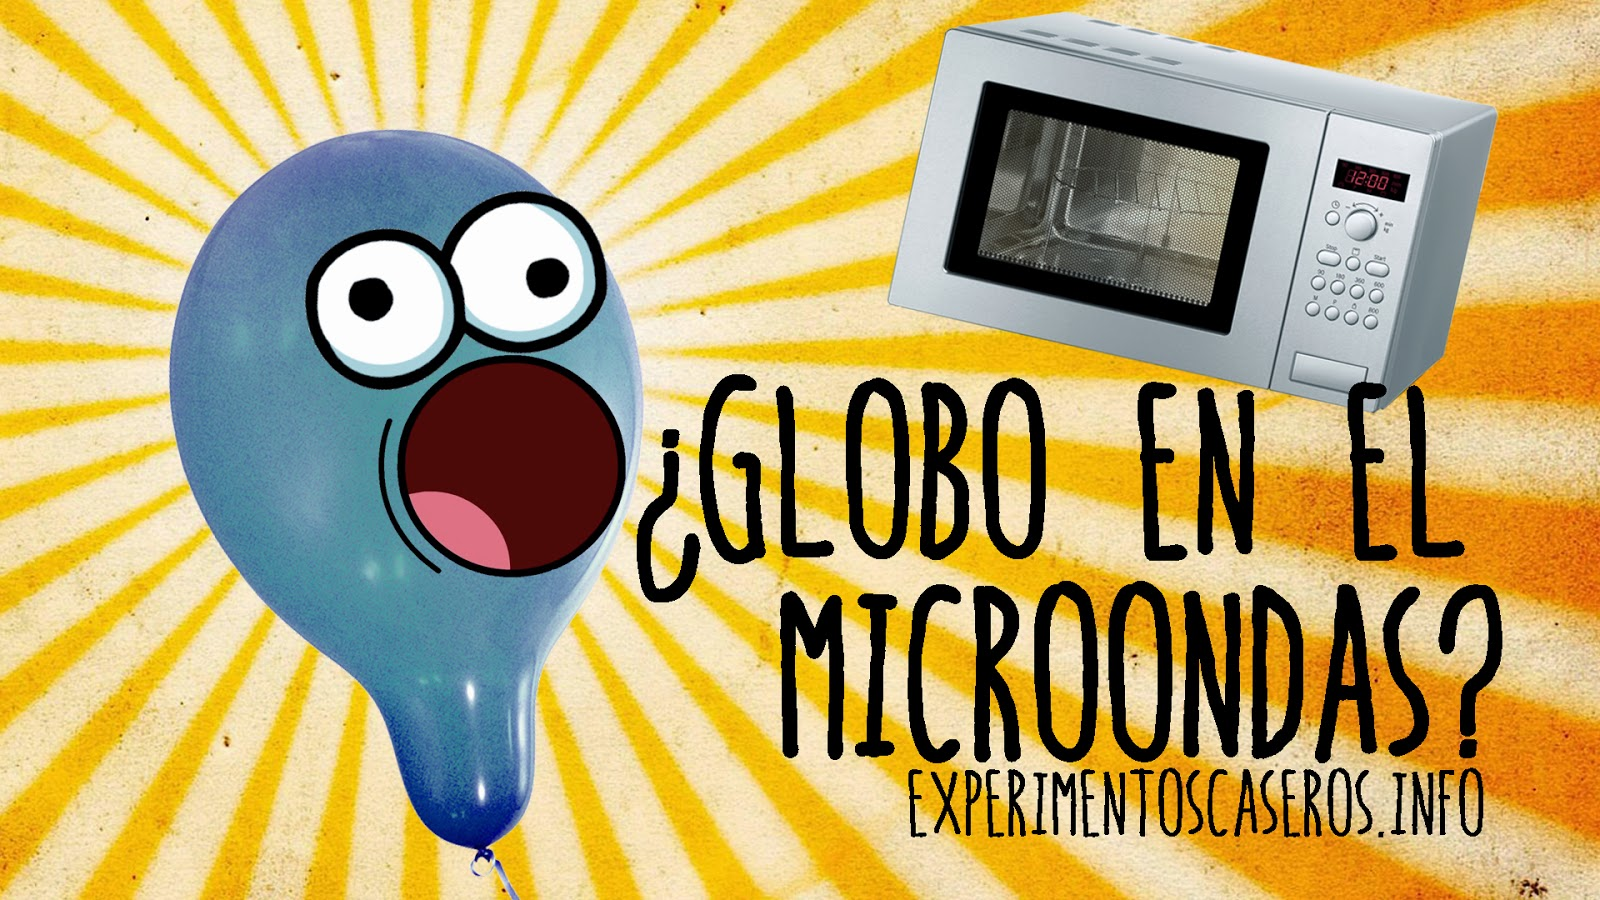 Cómo inflar un globo con un microondas, experimentos caseros para niños, globo, microondas, globo en el microondas, experimentos, experimento, ciencia, ciencia en casa, experimentos de ciencia, experimentos de física, experimentos para niños, experimentos caseros, experimento casero, experimentos sencillos, feria de ciencias, experimento para la feria de ciencias, ciencia casera, explicación científica